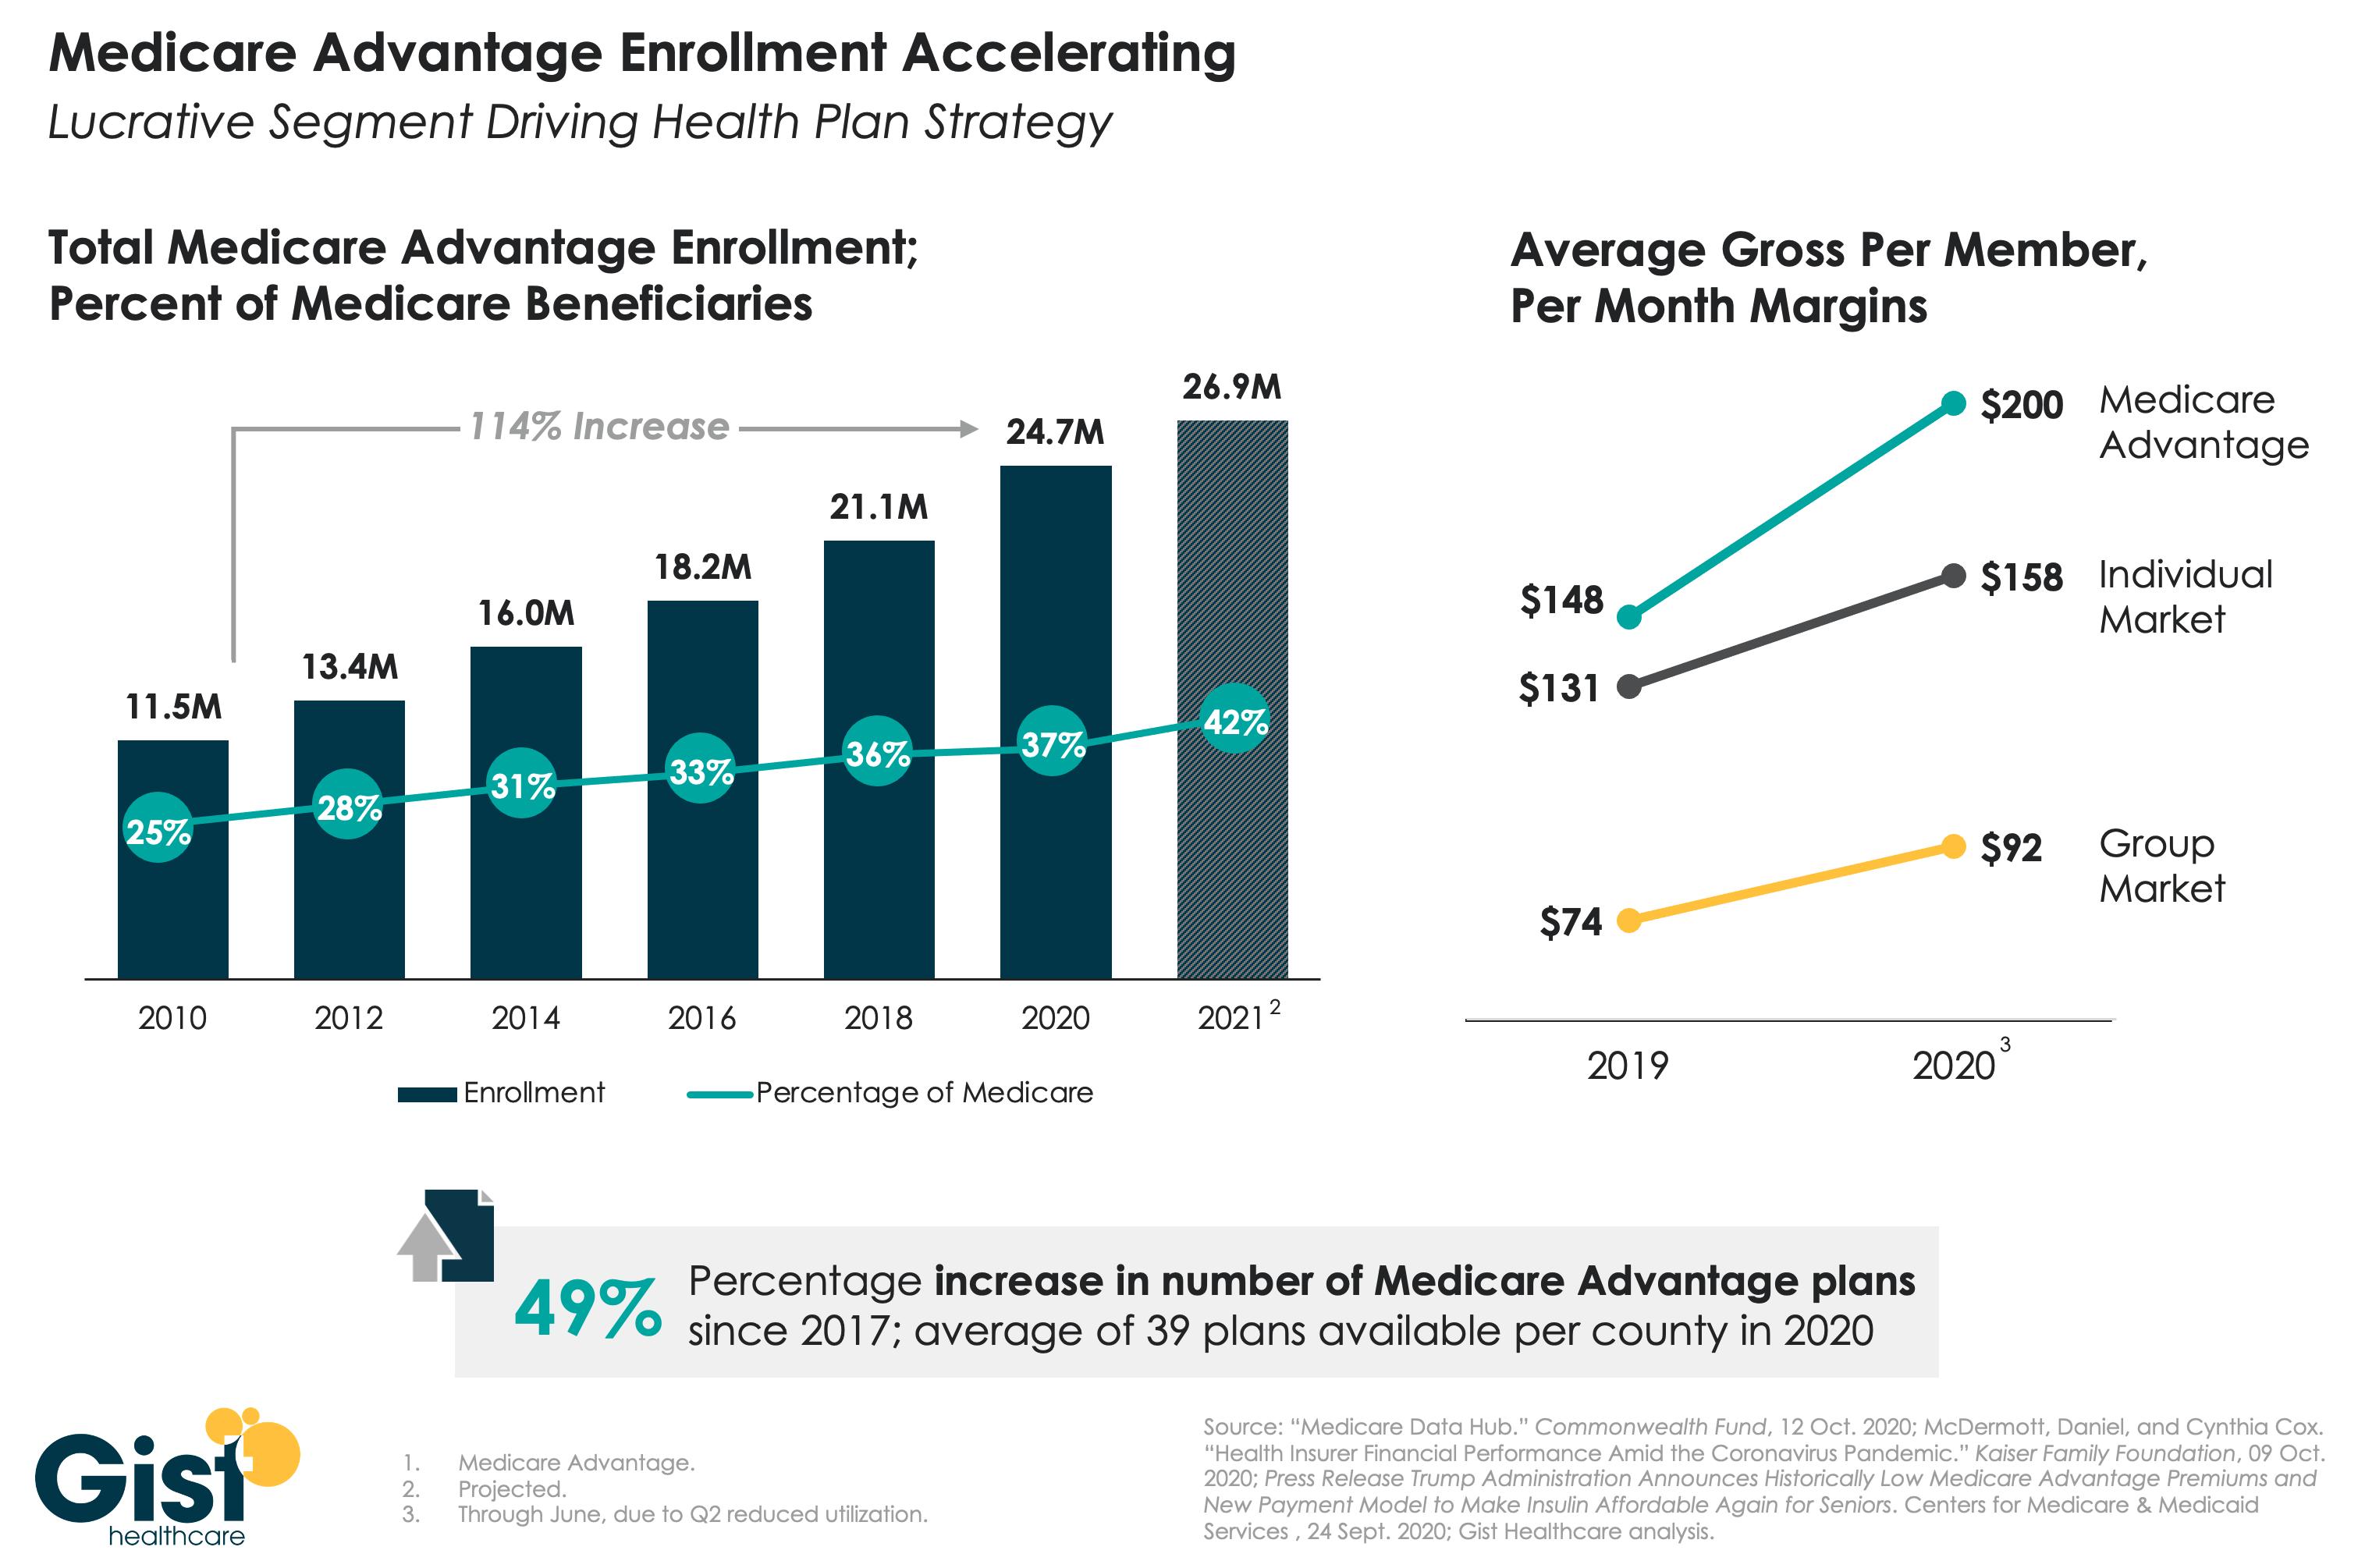 Medicare Advantage growth